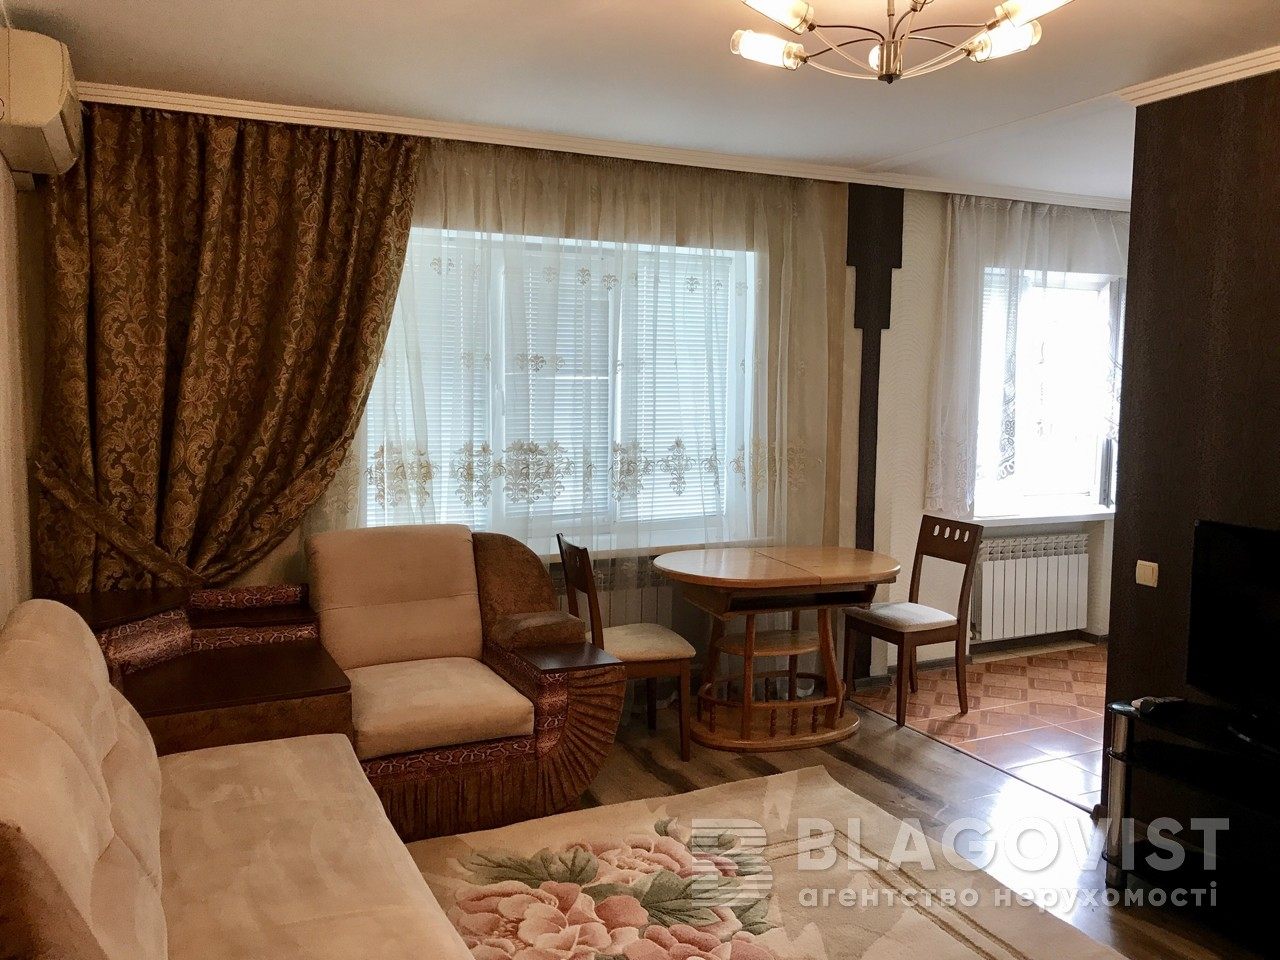 Квартира X-5195, Леси Украинки бульв., 19, Киев - Фото 1